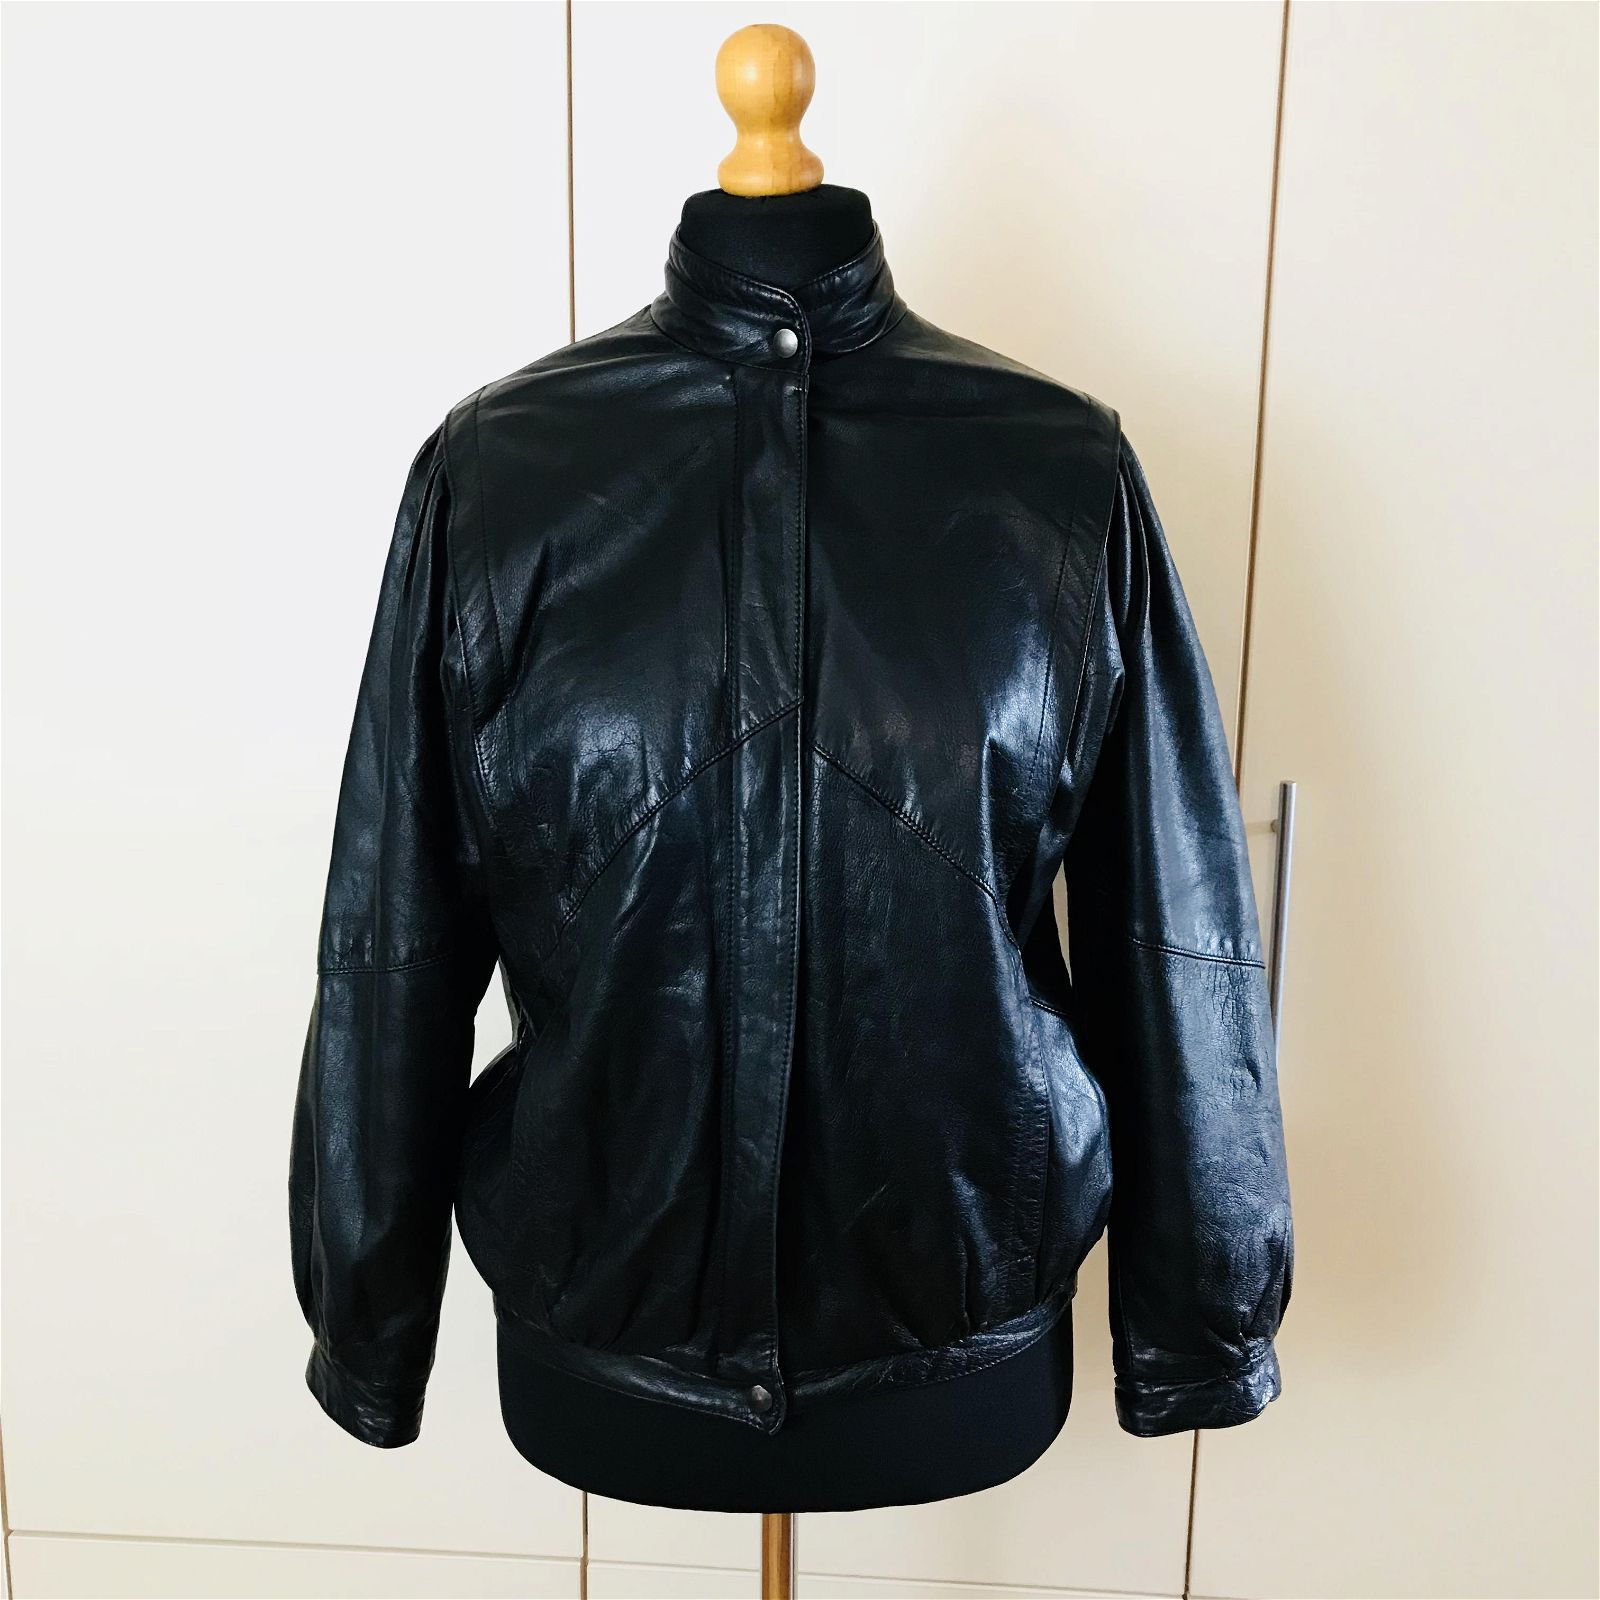 Vintage Women's Black Leather Jacket Coat